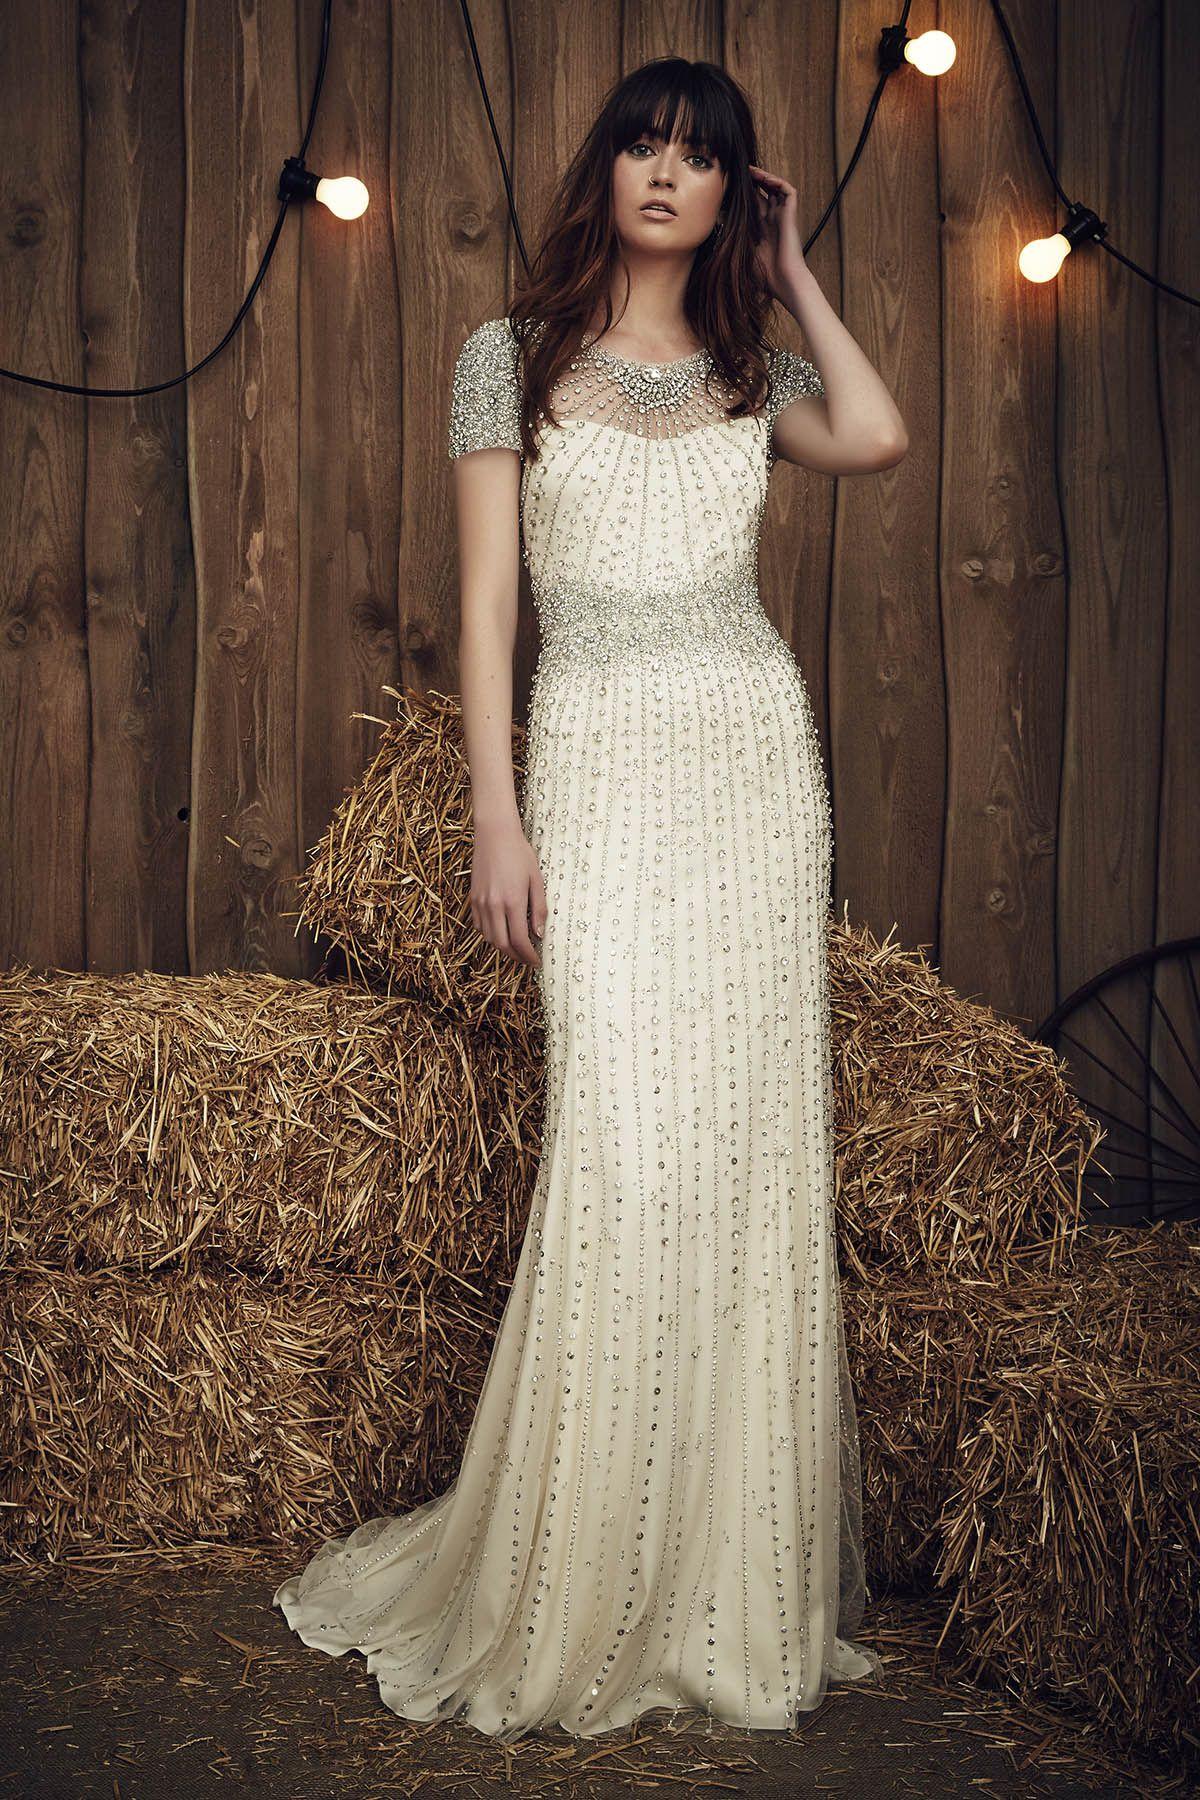 Jenny Packham Wedding Dresses for Sale - Cute Dresses for A Wedding ...